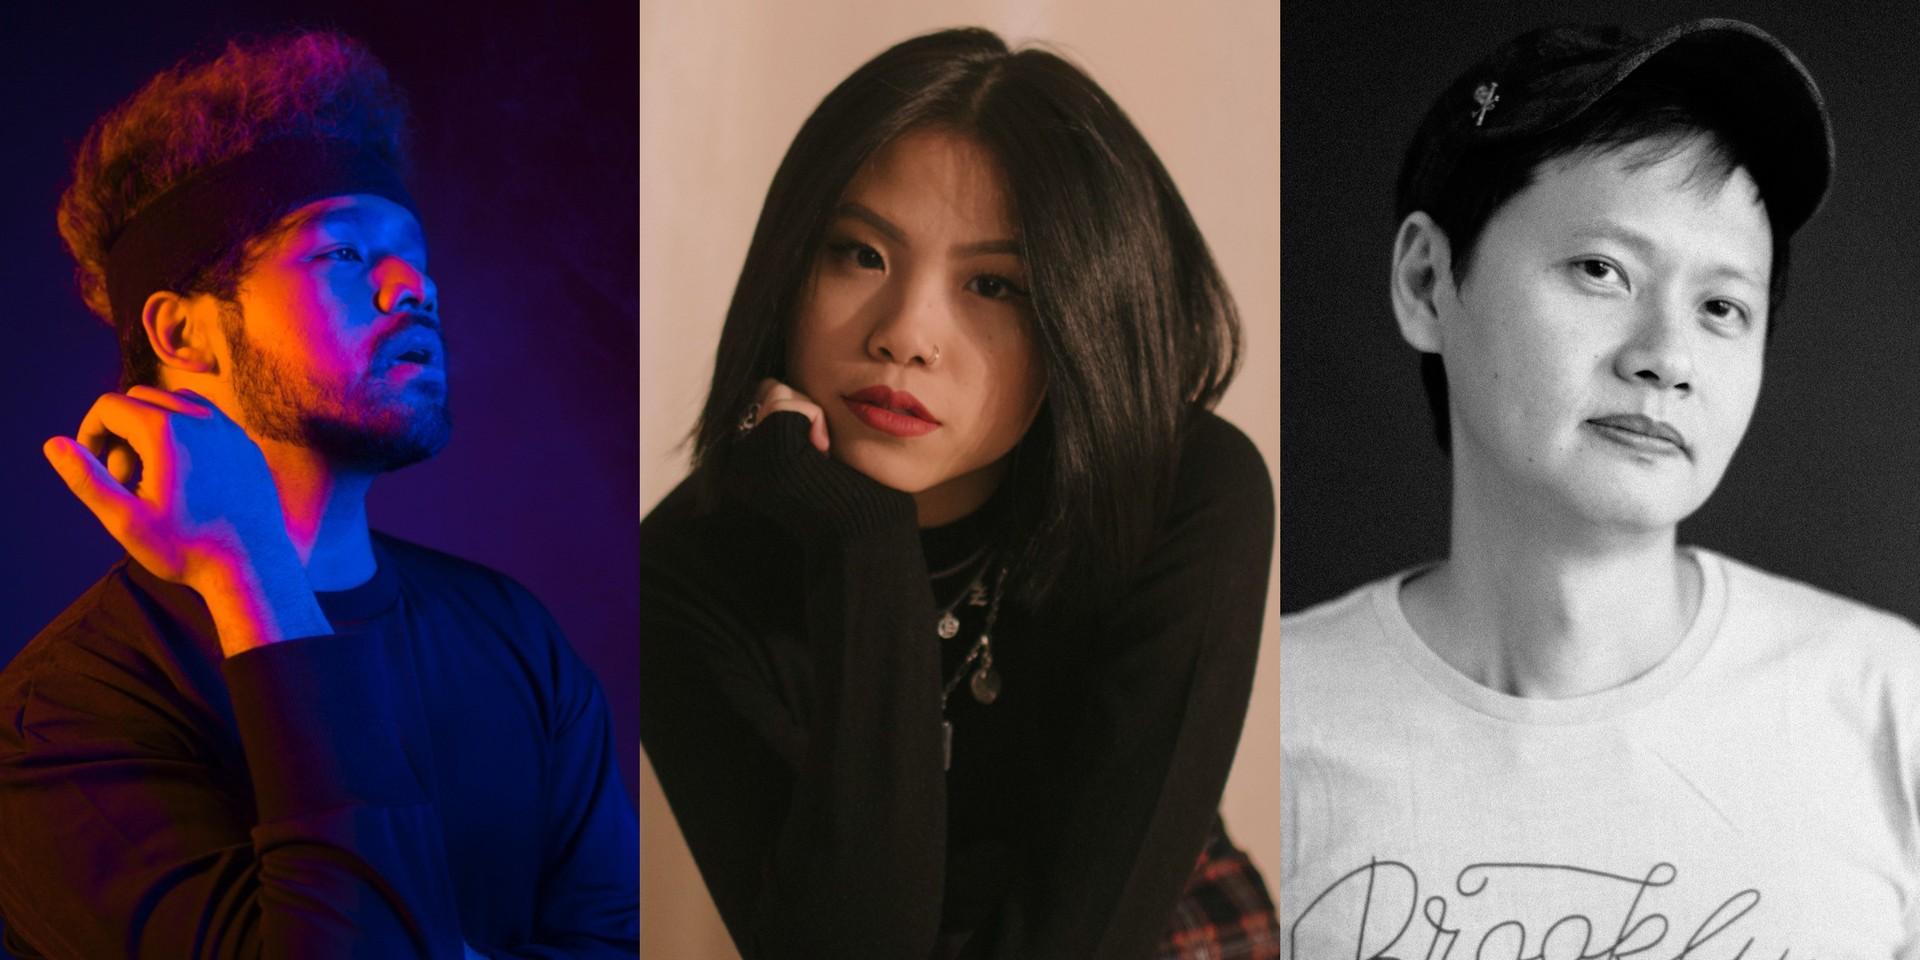 Singapore Sevens Splash Party line-up announced – Joshua Simon, EATMEPOPTART, EMONIGHTSG and more